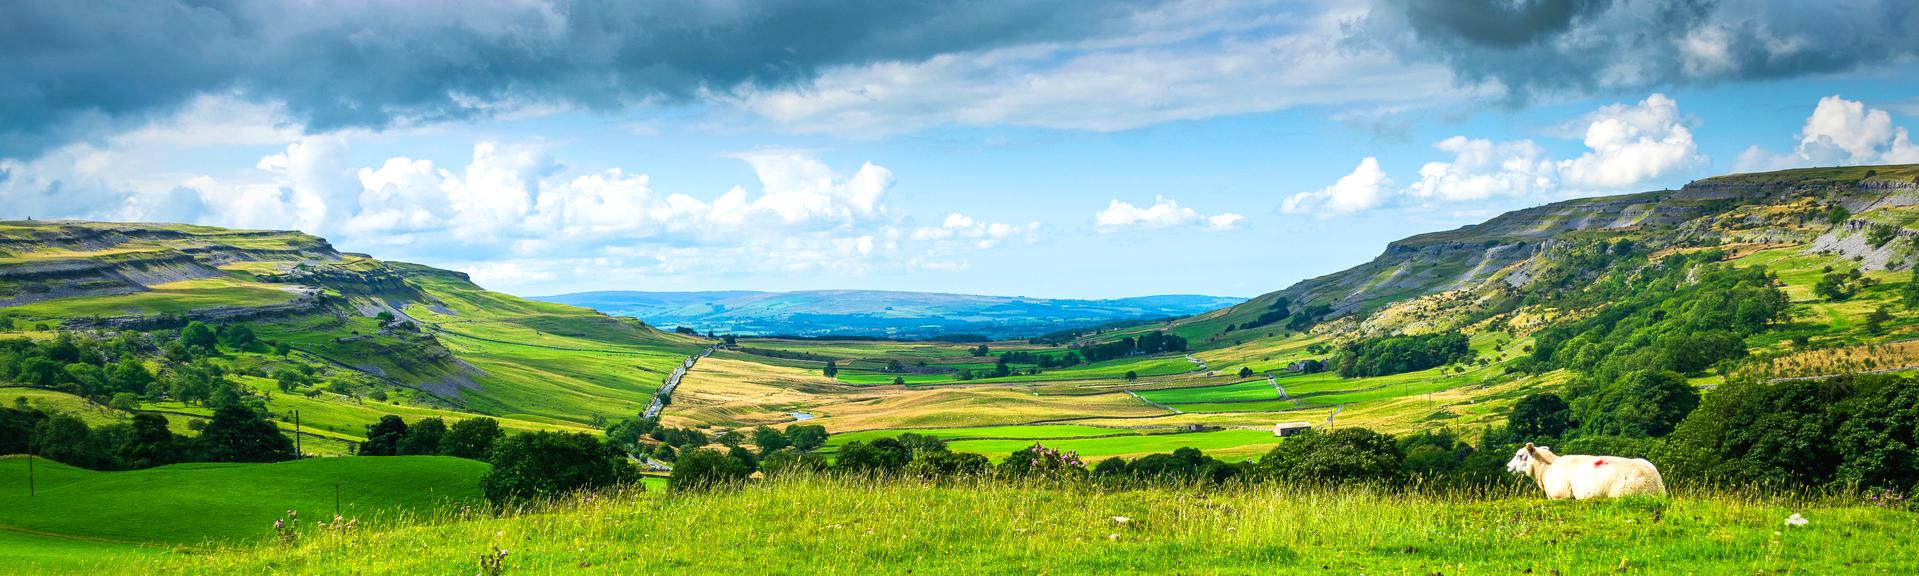 Rural scene. Yorkshire Dales National Park